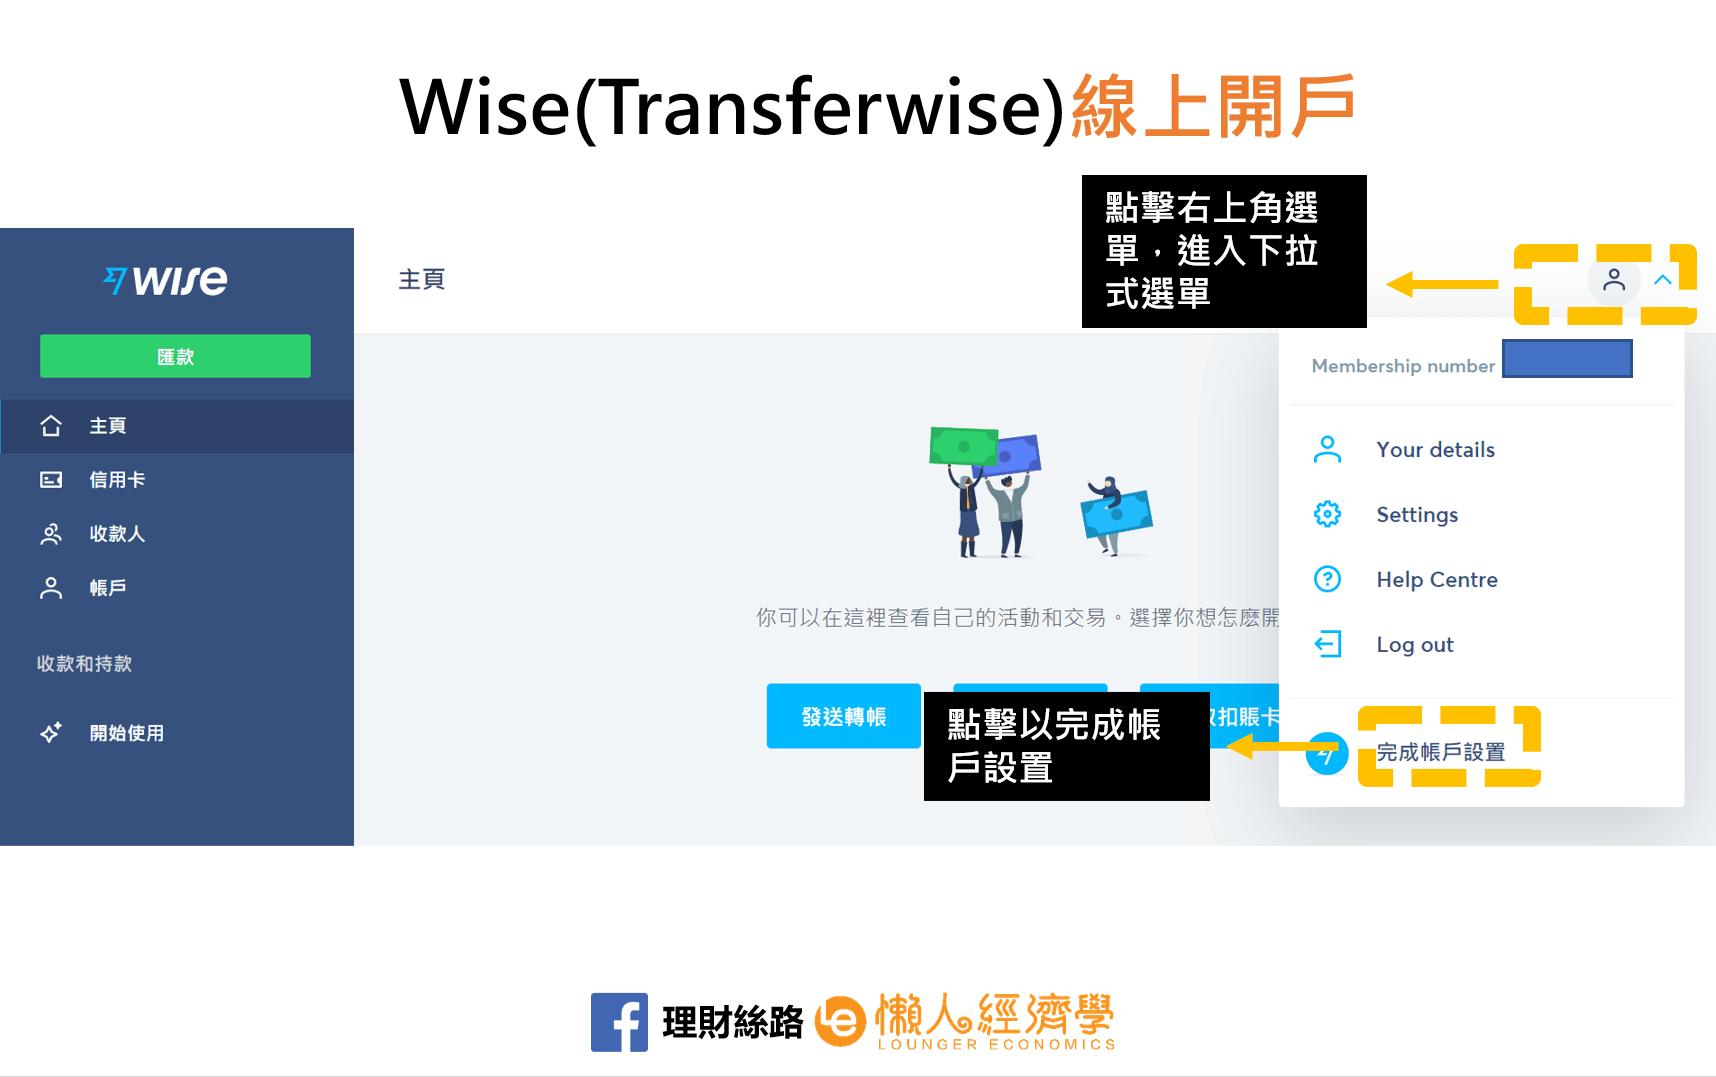 WISE完成帳戶設置